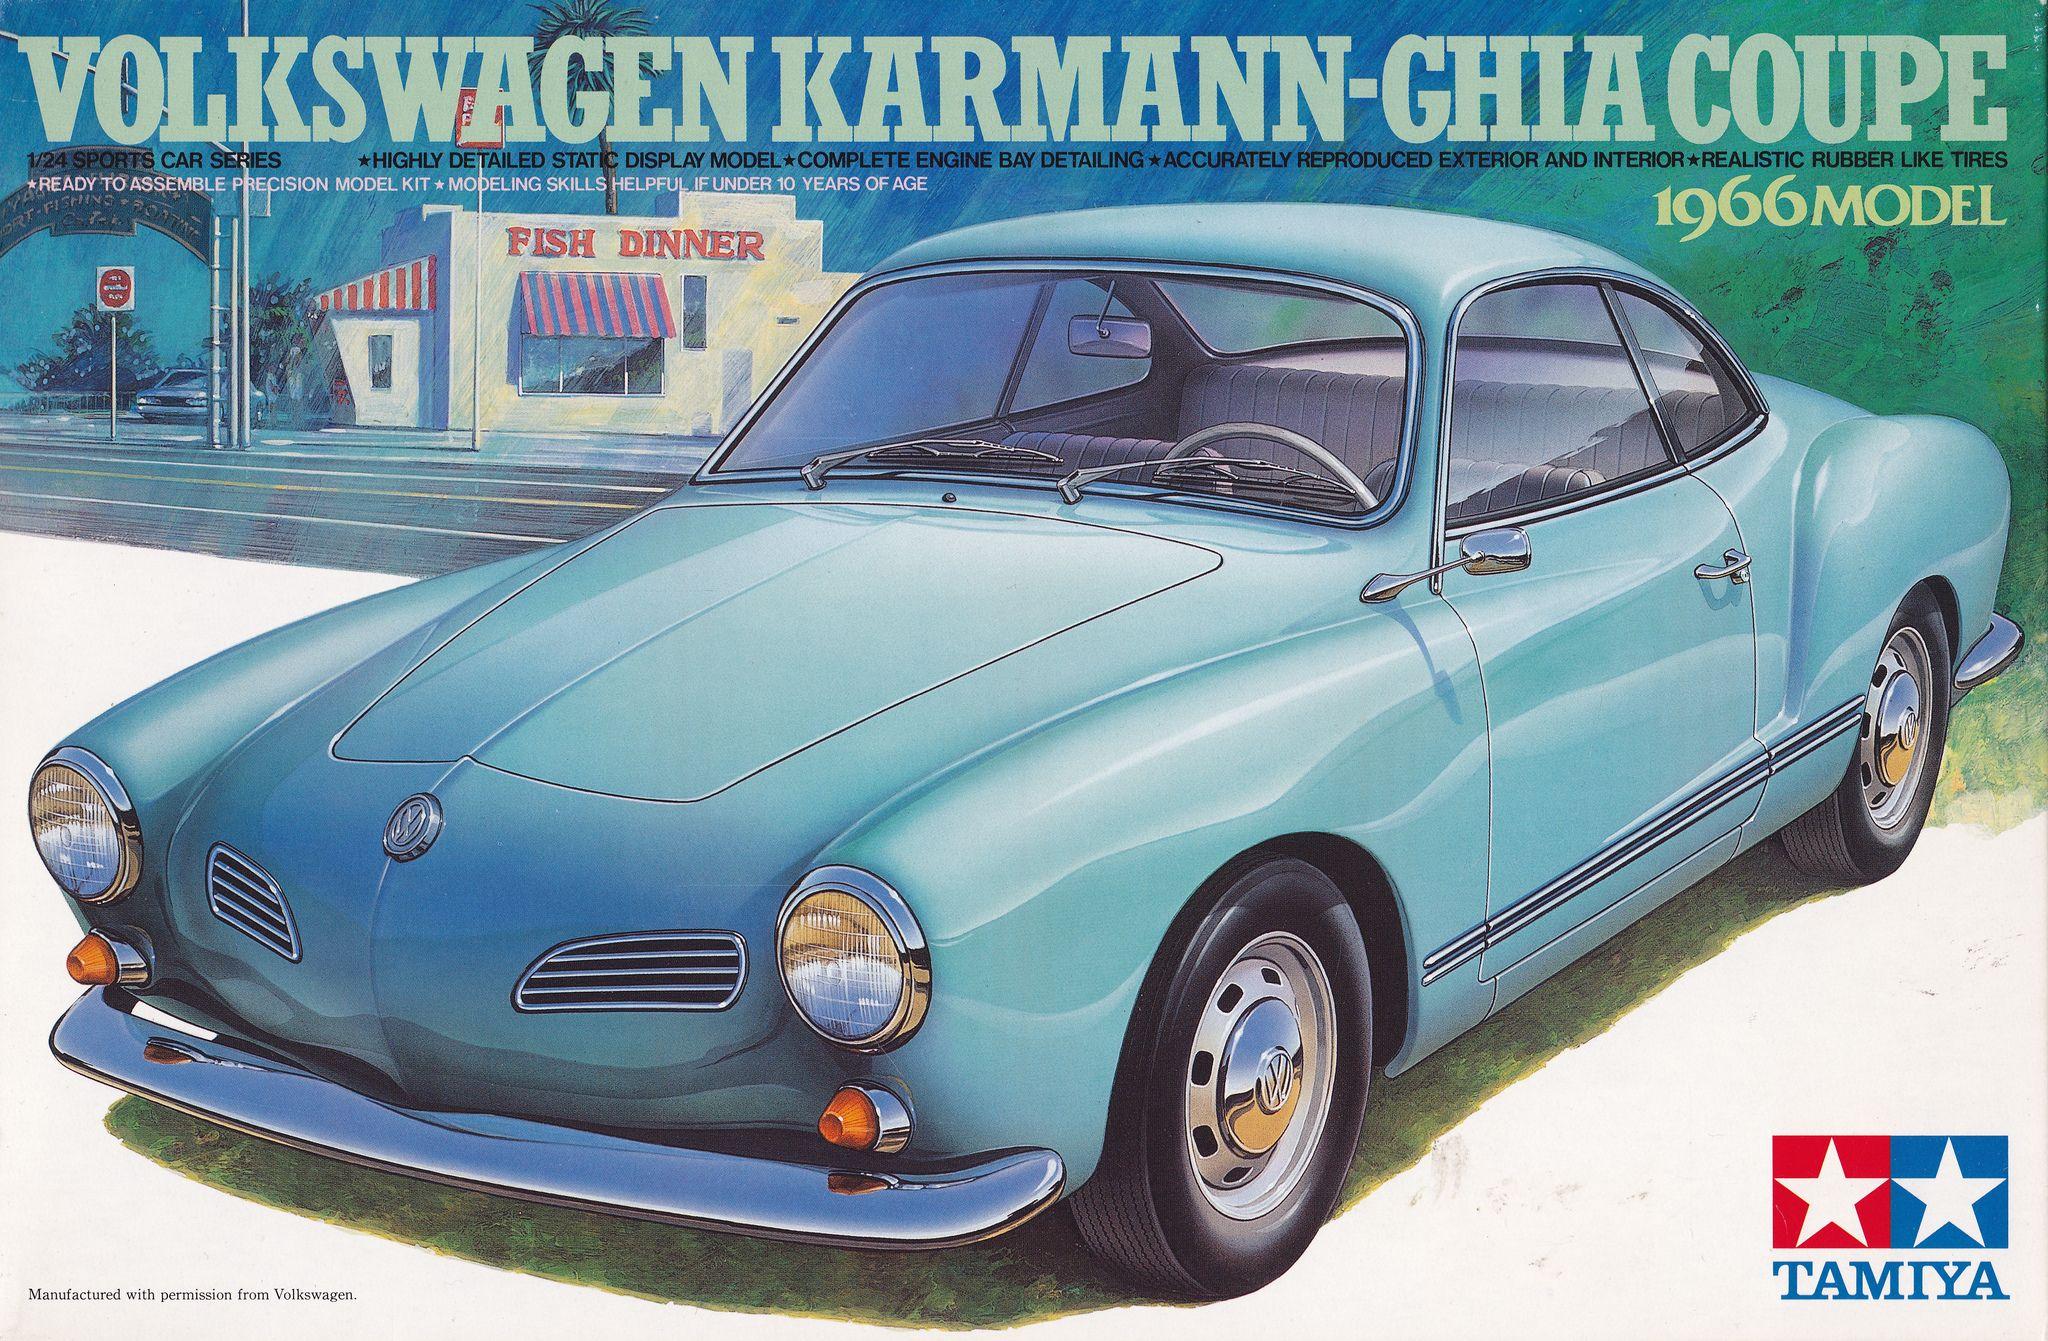 All Sizes Volkswagen Karmann Ghia Flickr Photo Sharing